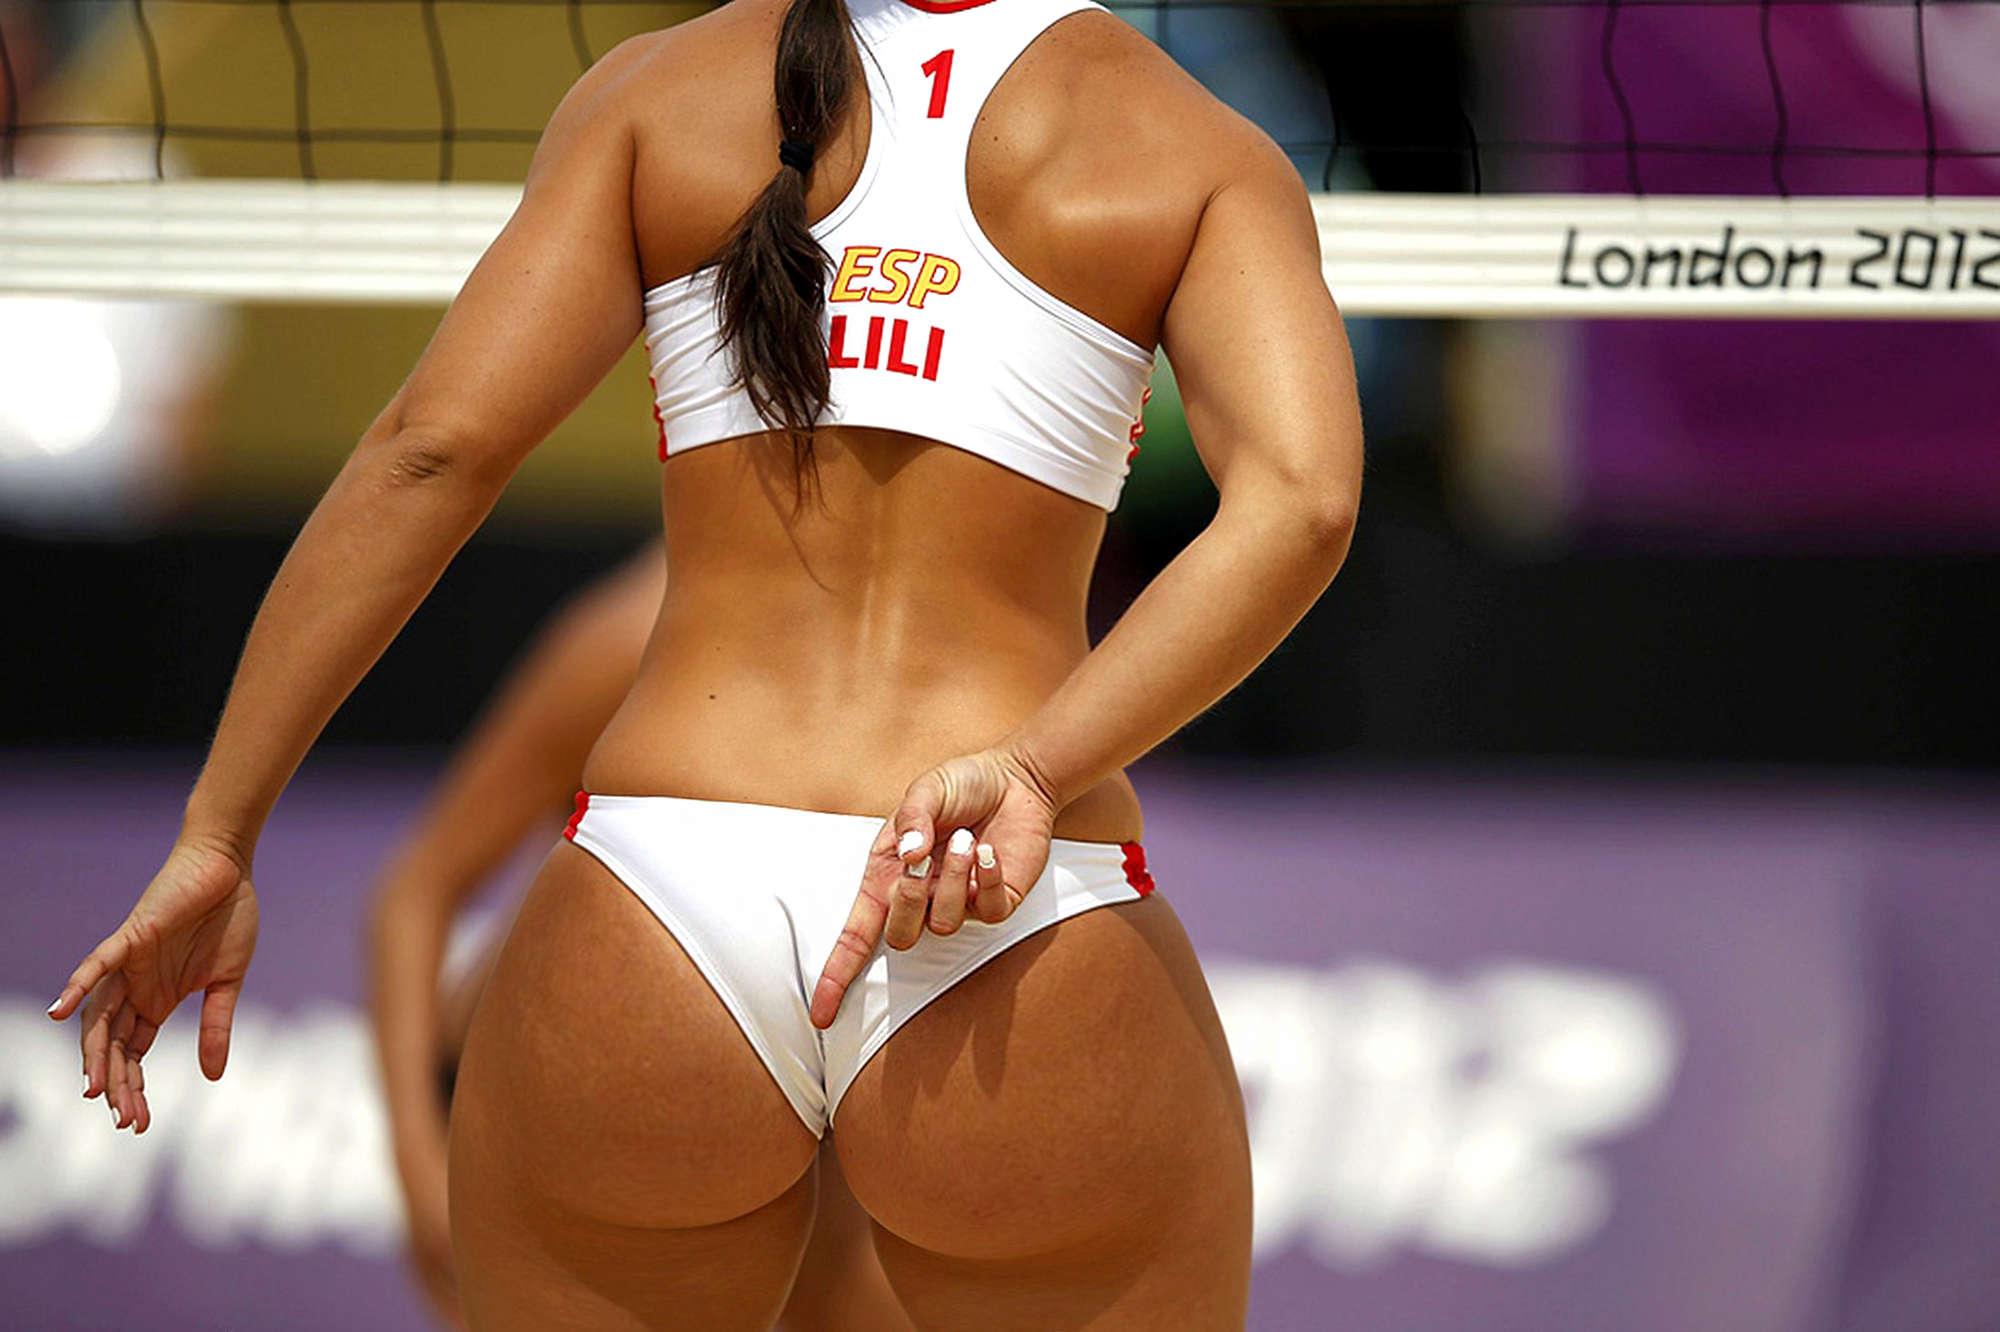 Sexy culo alle olimpiadi